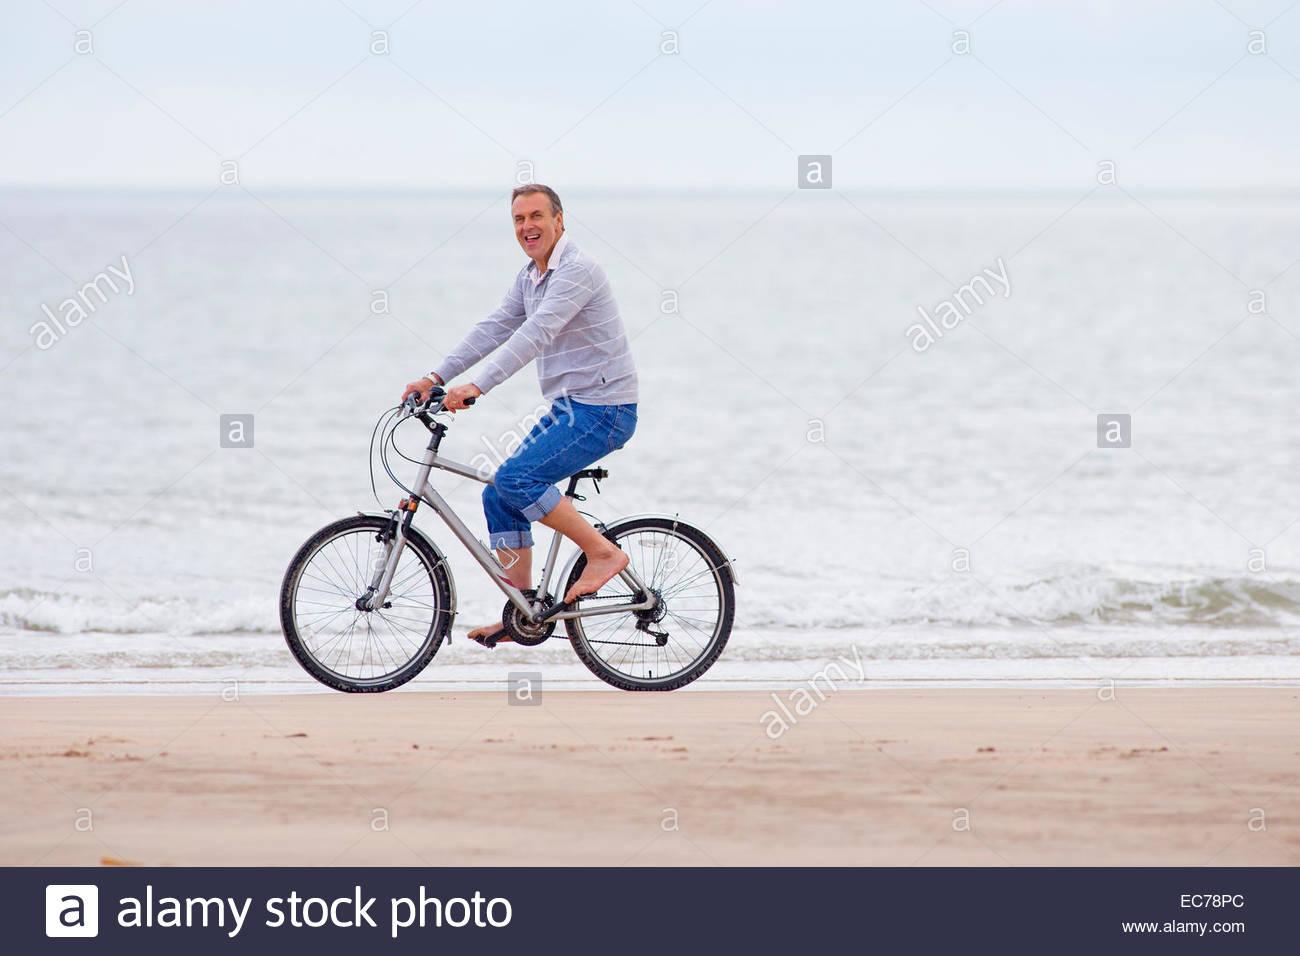 Older man riding bicycle on beach - Stock Image